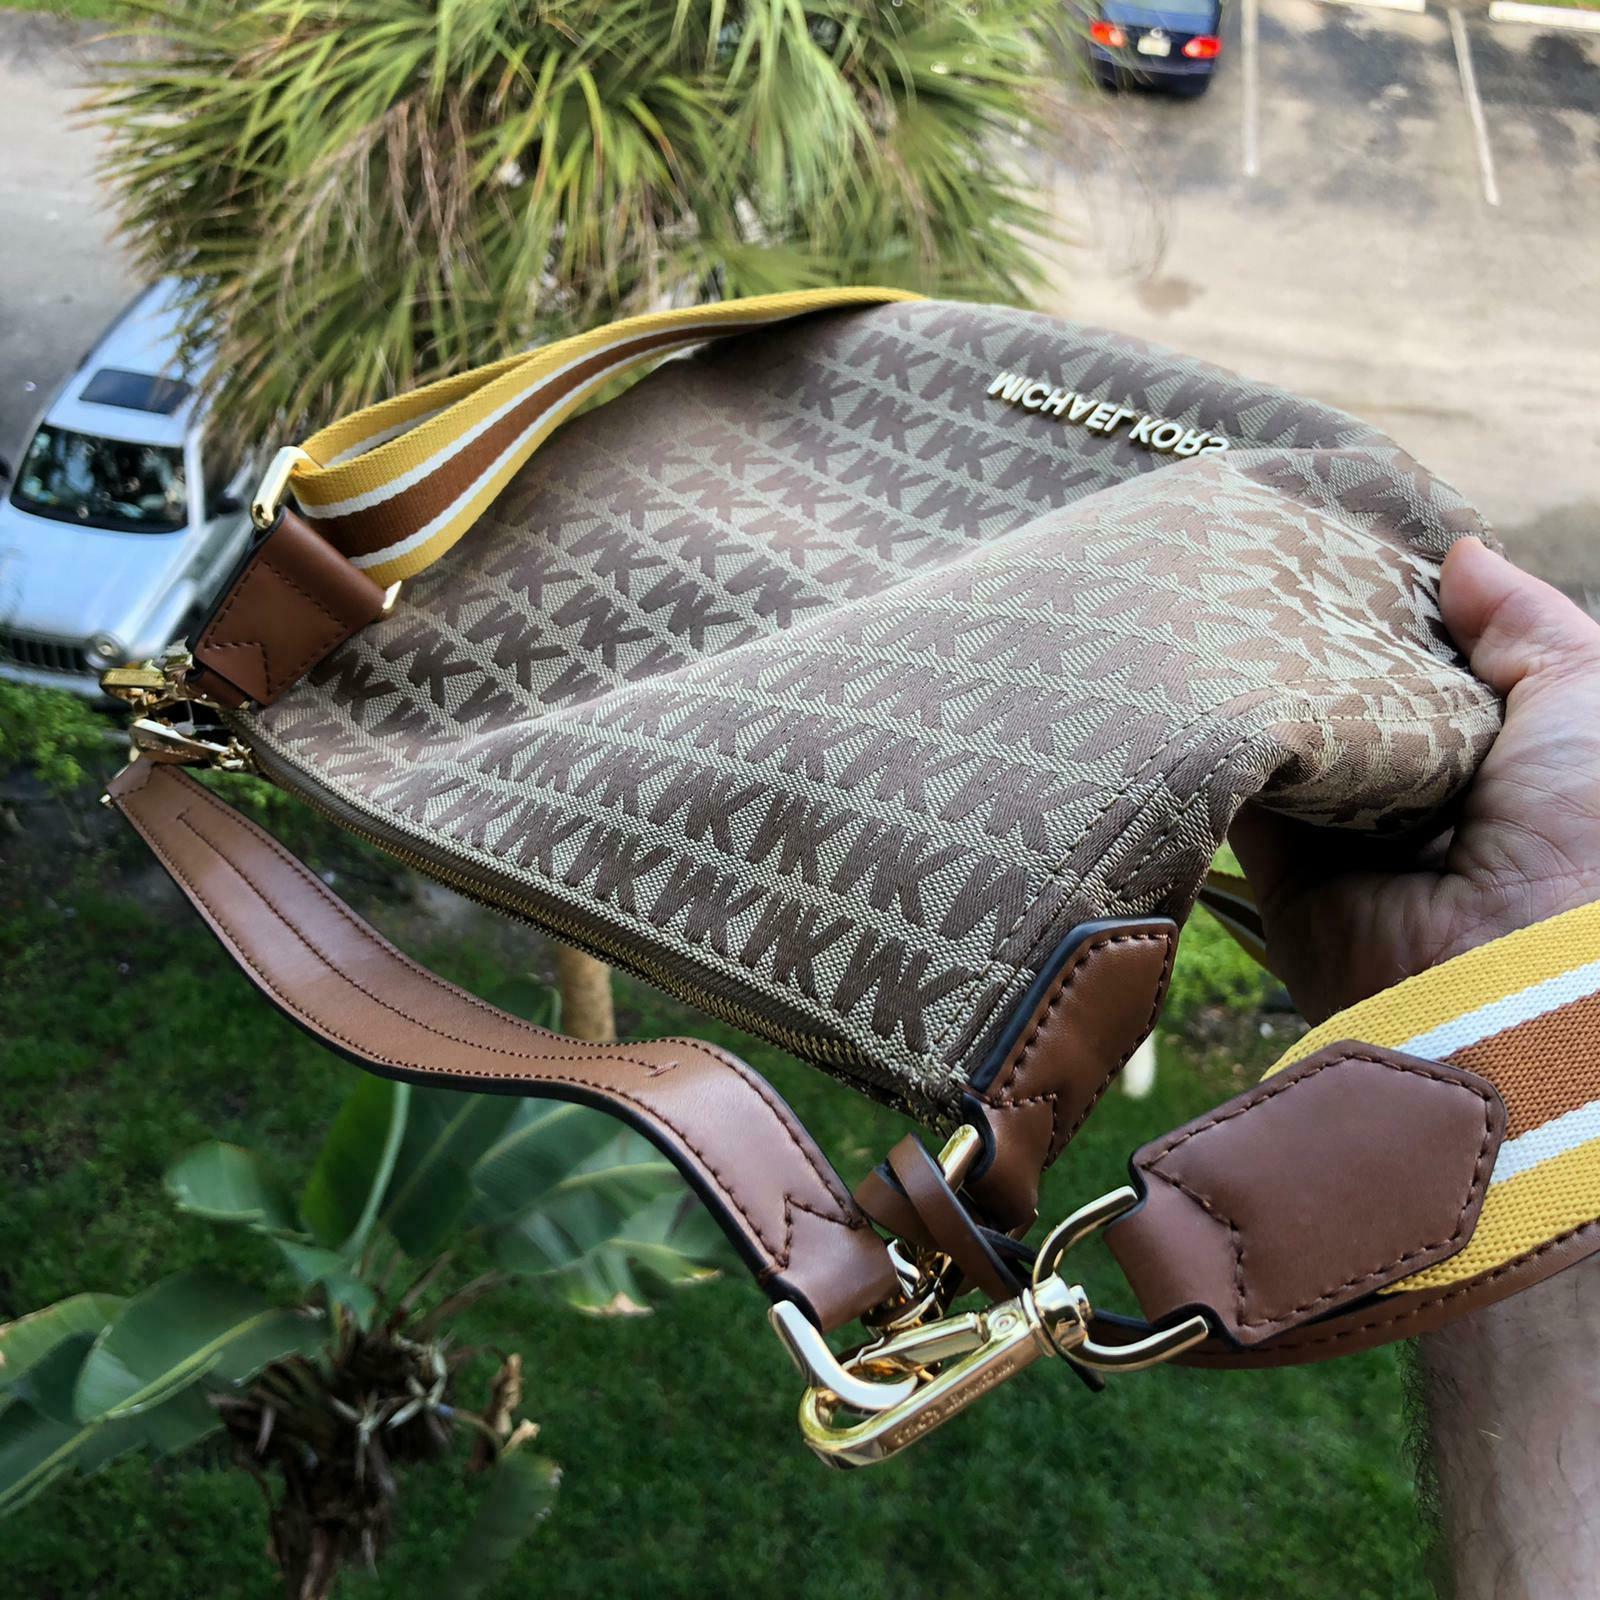 Michael Kors Leather Shoulder Handbag Purse